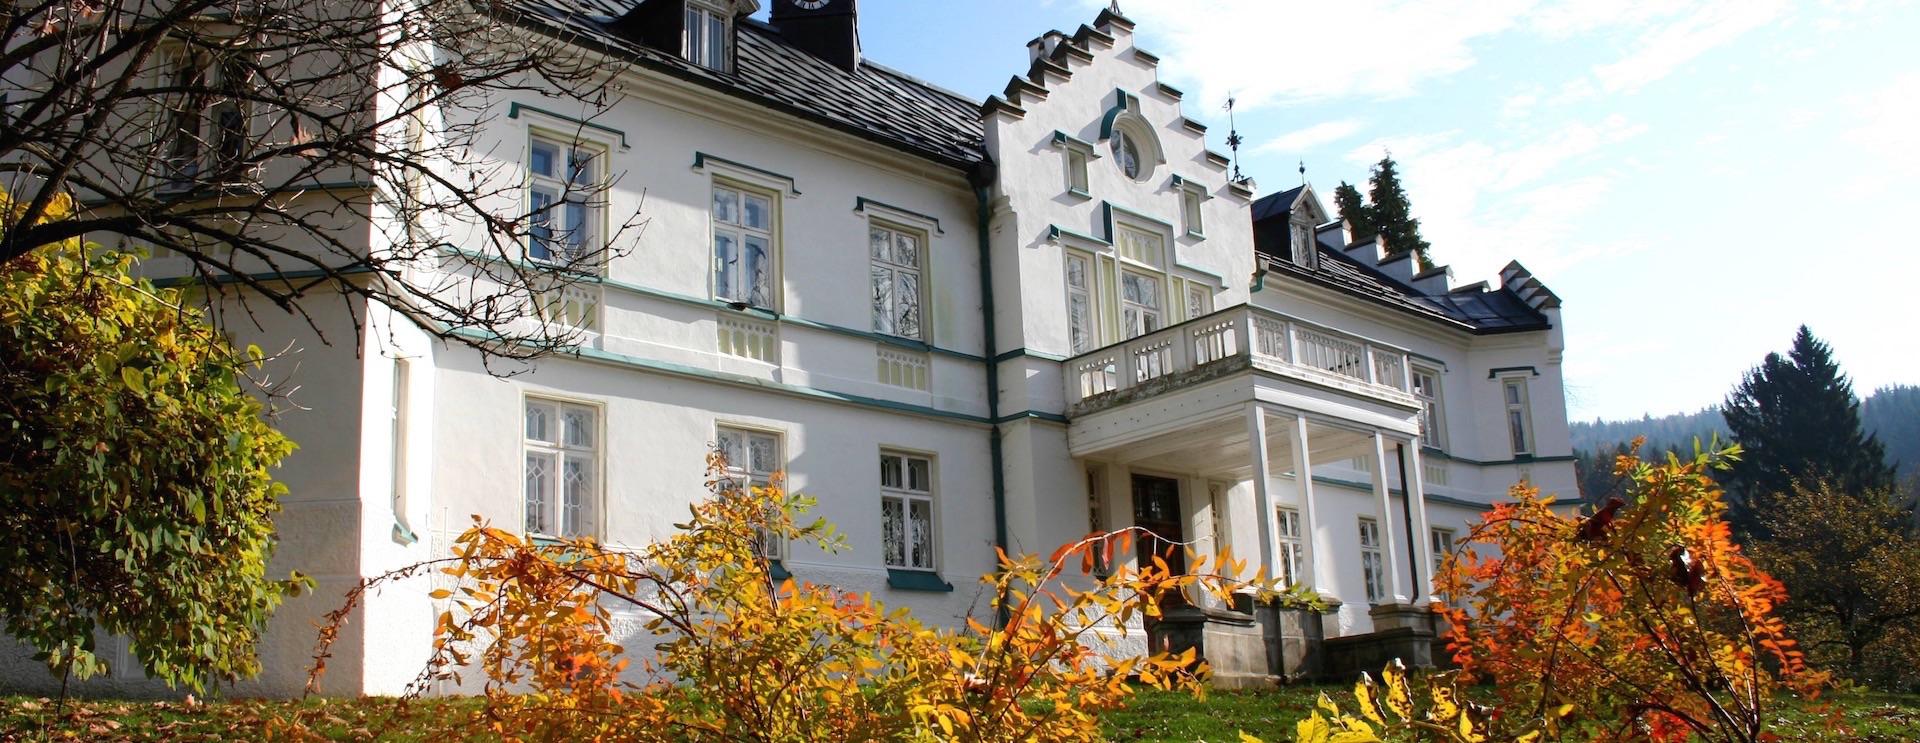 Förderkreis Schloss Buchenau e.V.